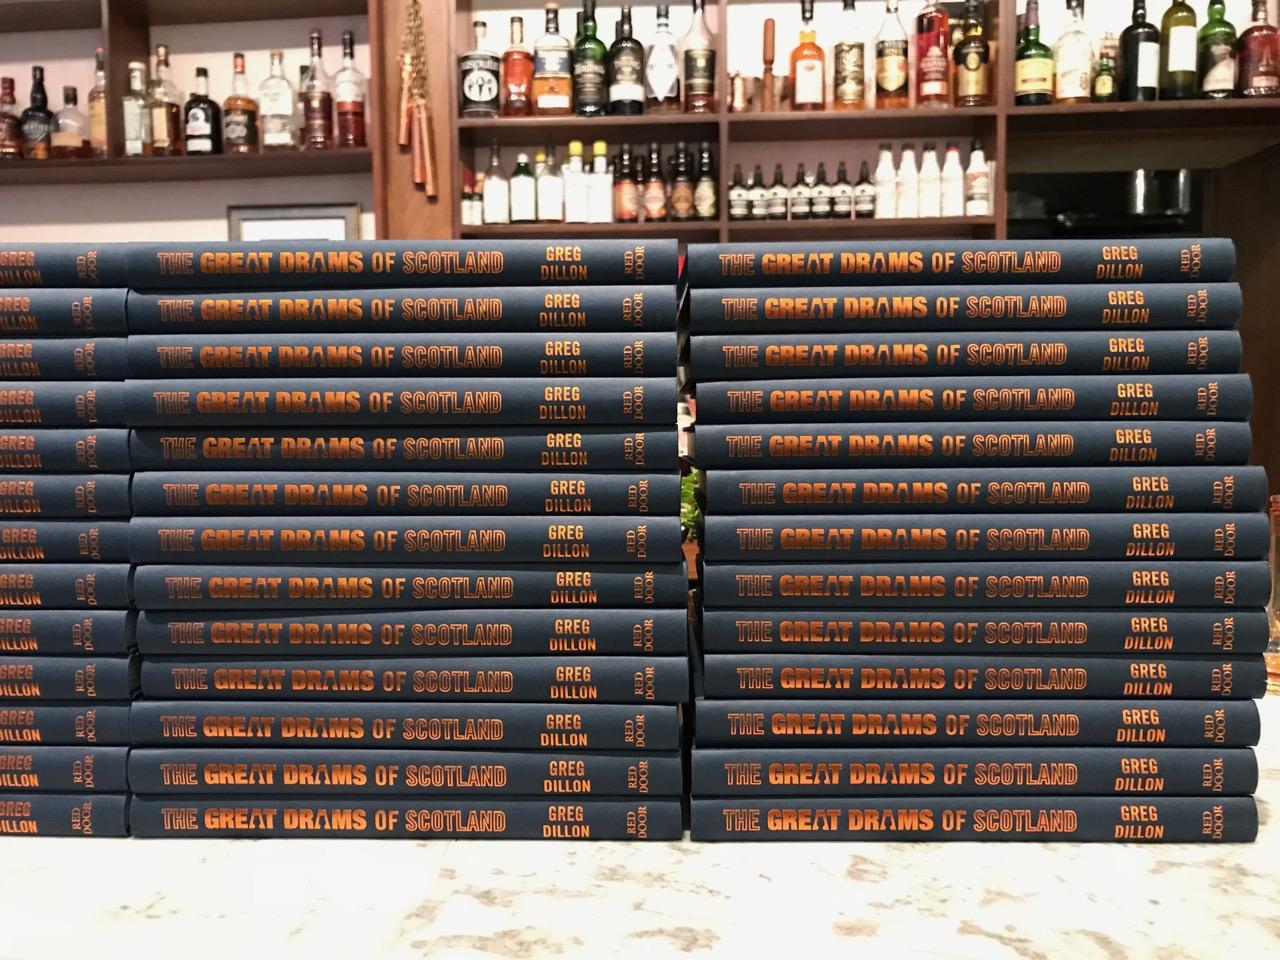 the greatdrams of scotland book a whisky book by greg dillon